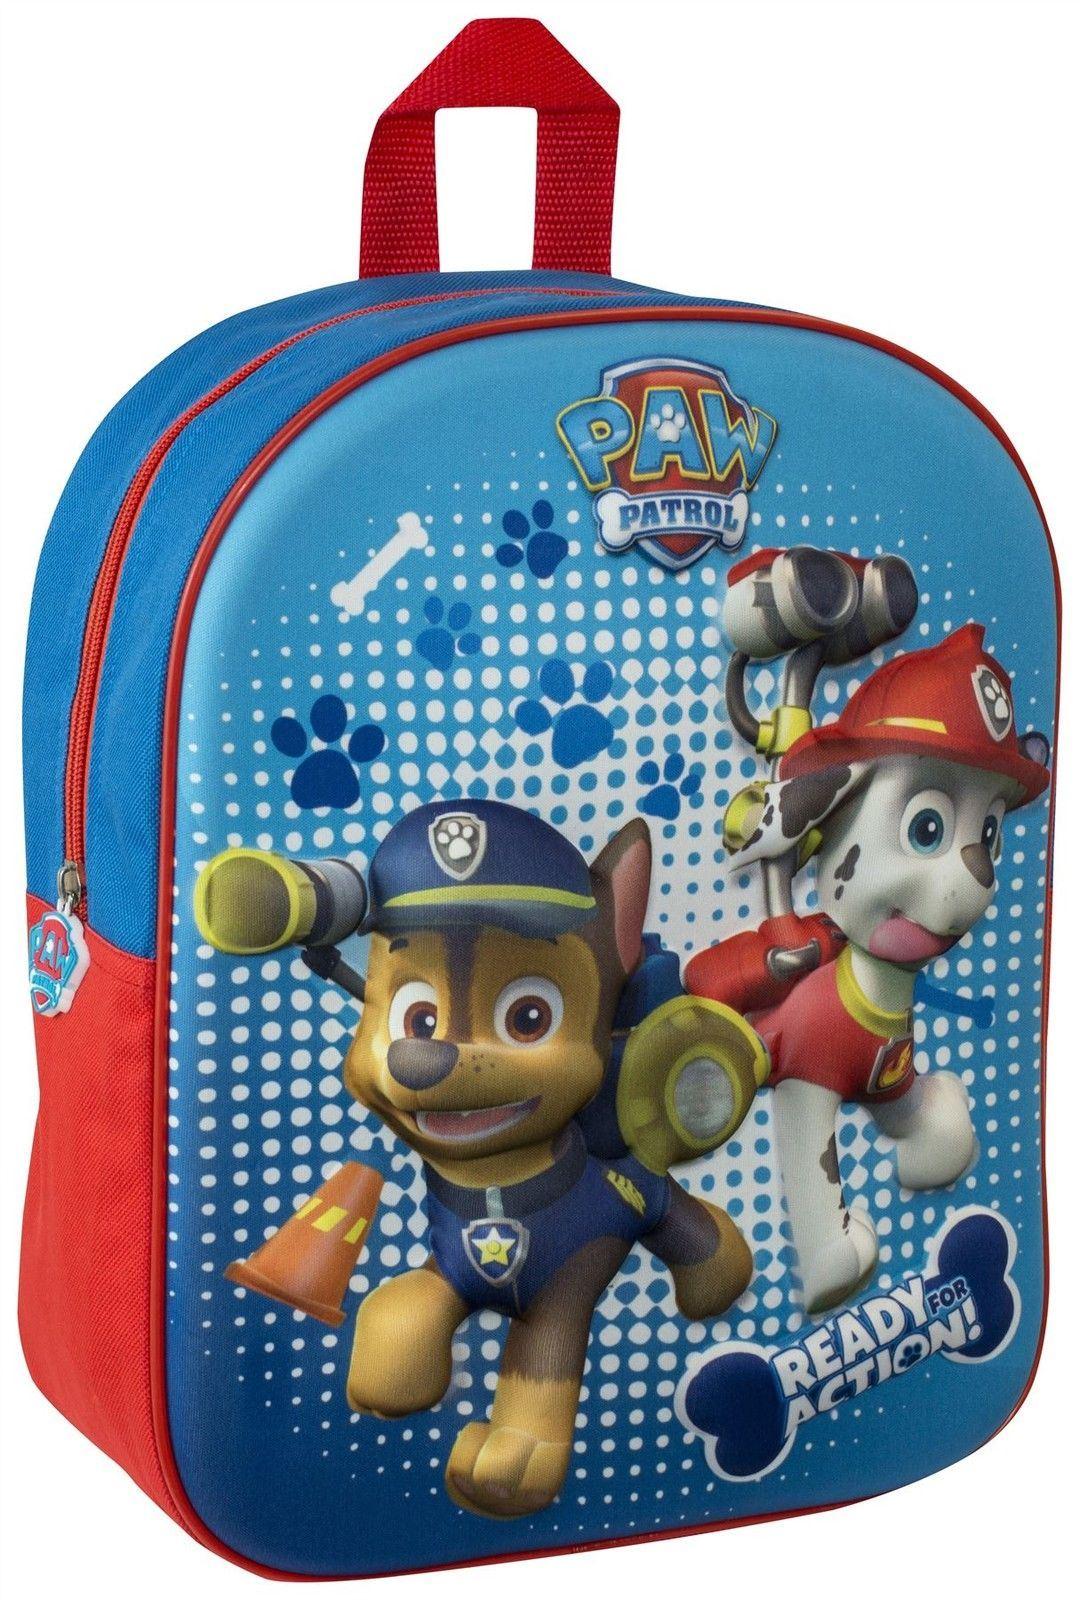 3D Character Design School Bag For Childrens